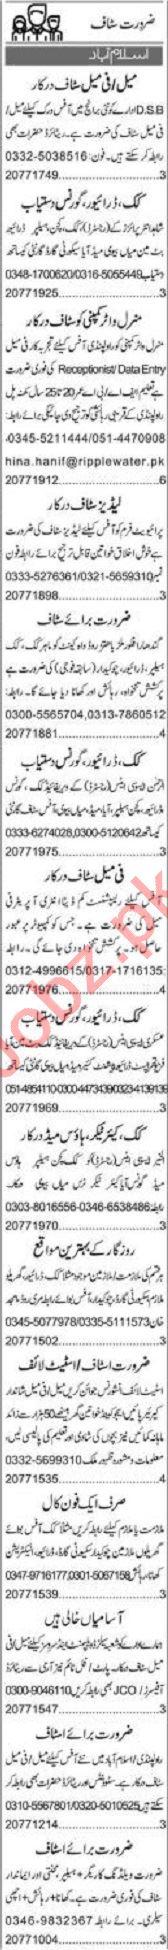 Express Sunday Islamabad Classified Ads 5th July 2020